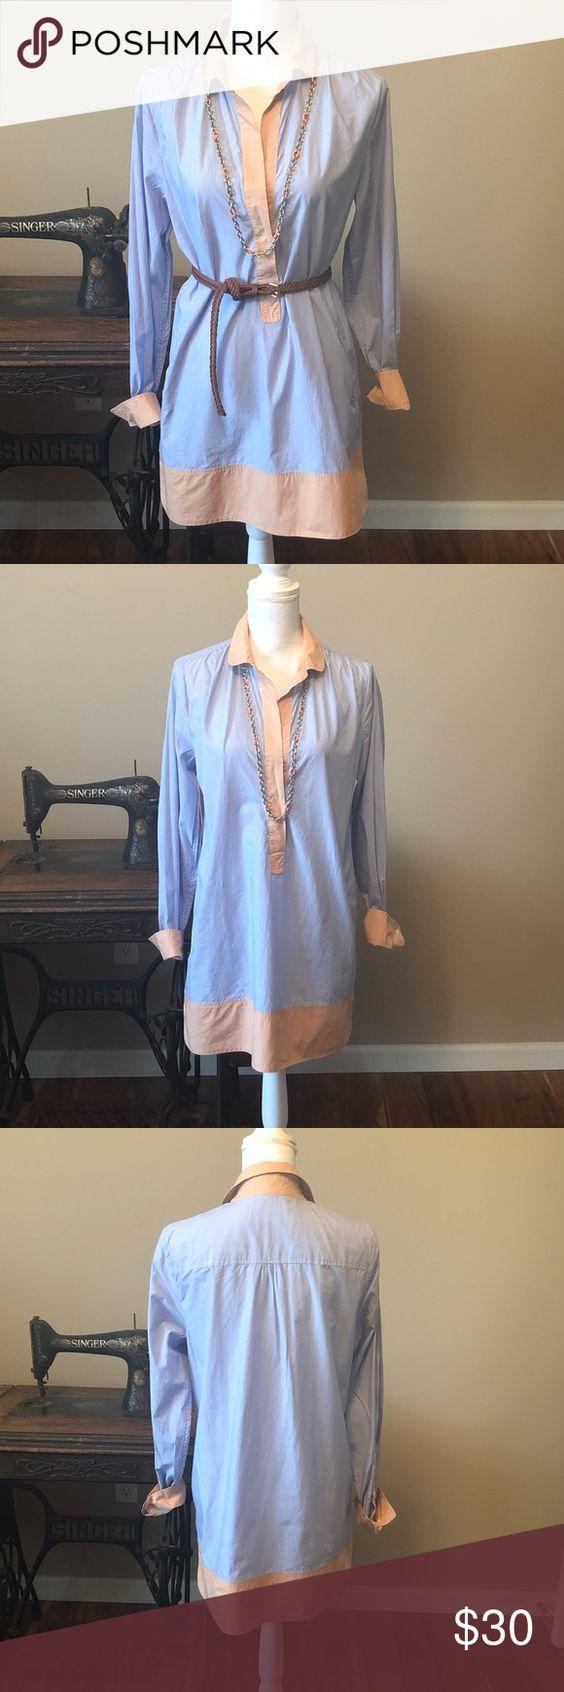 Stylish Peach Summer Dress